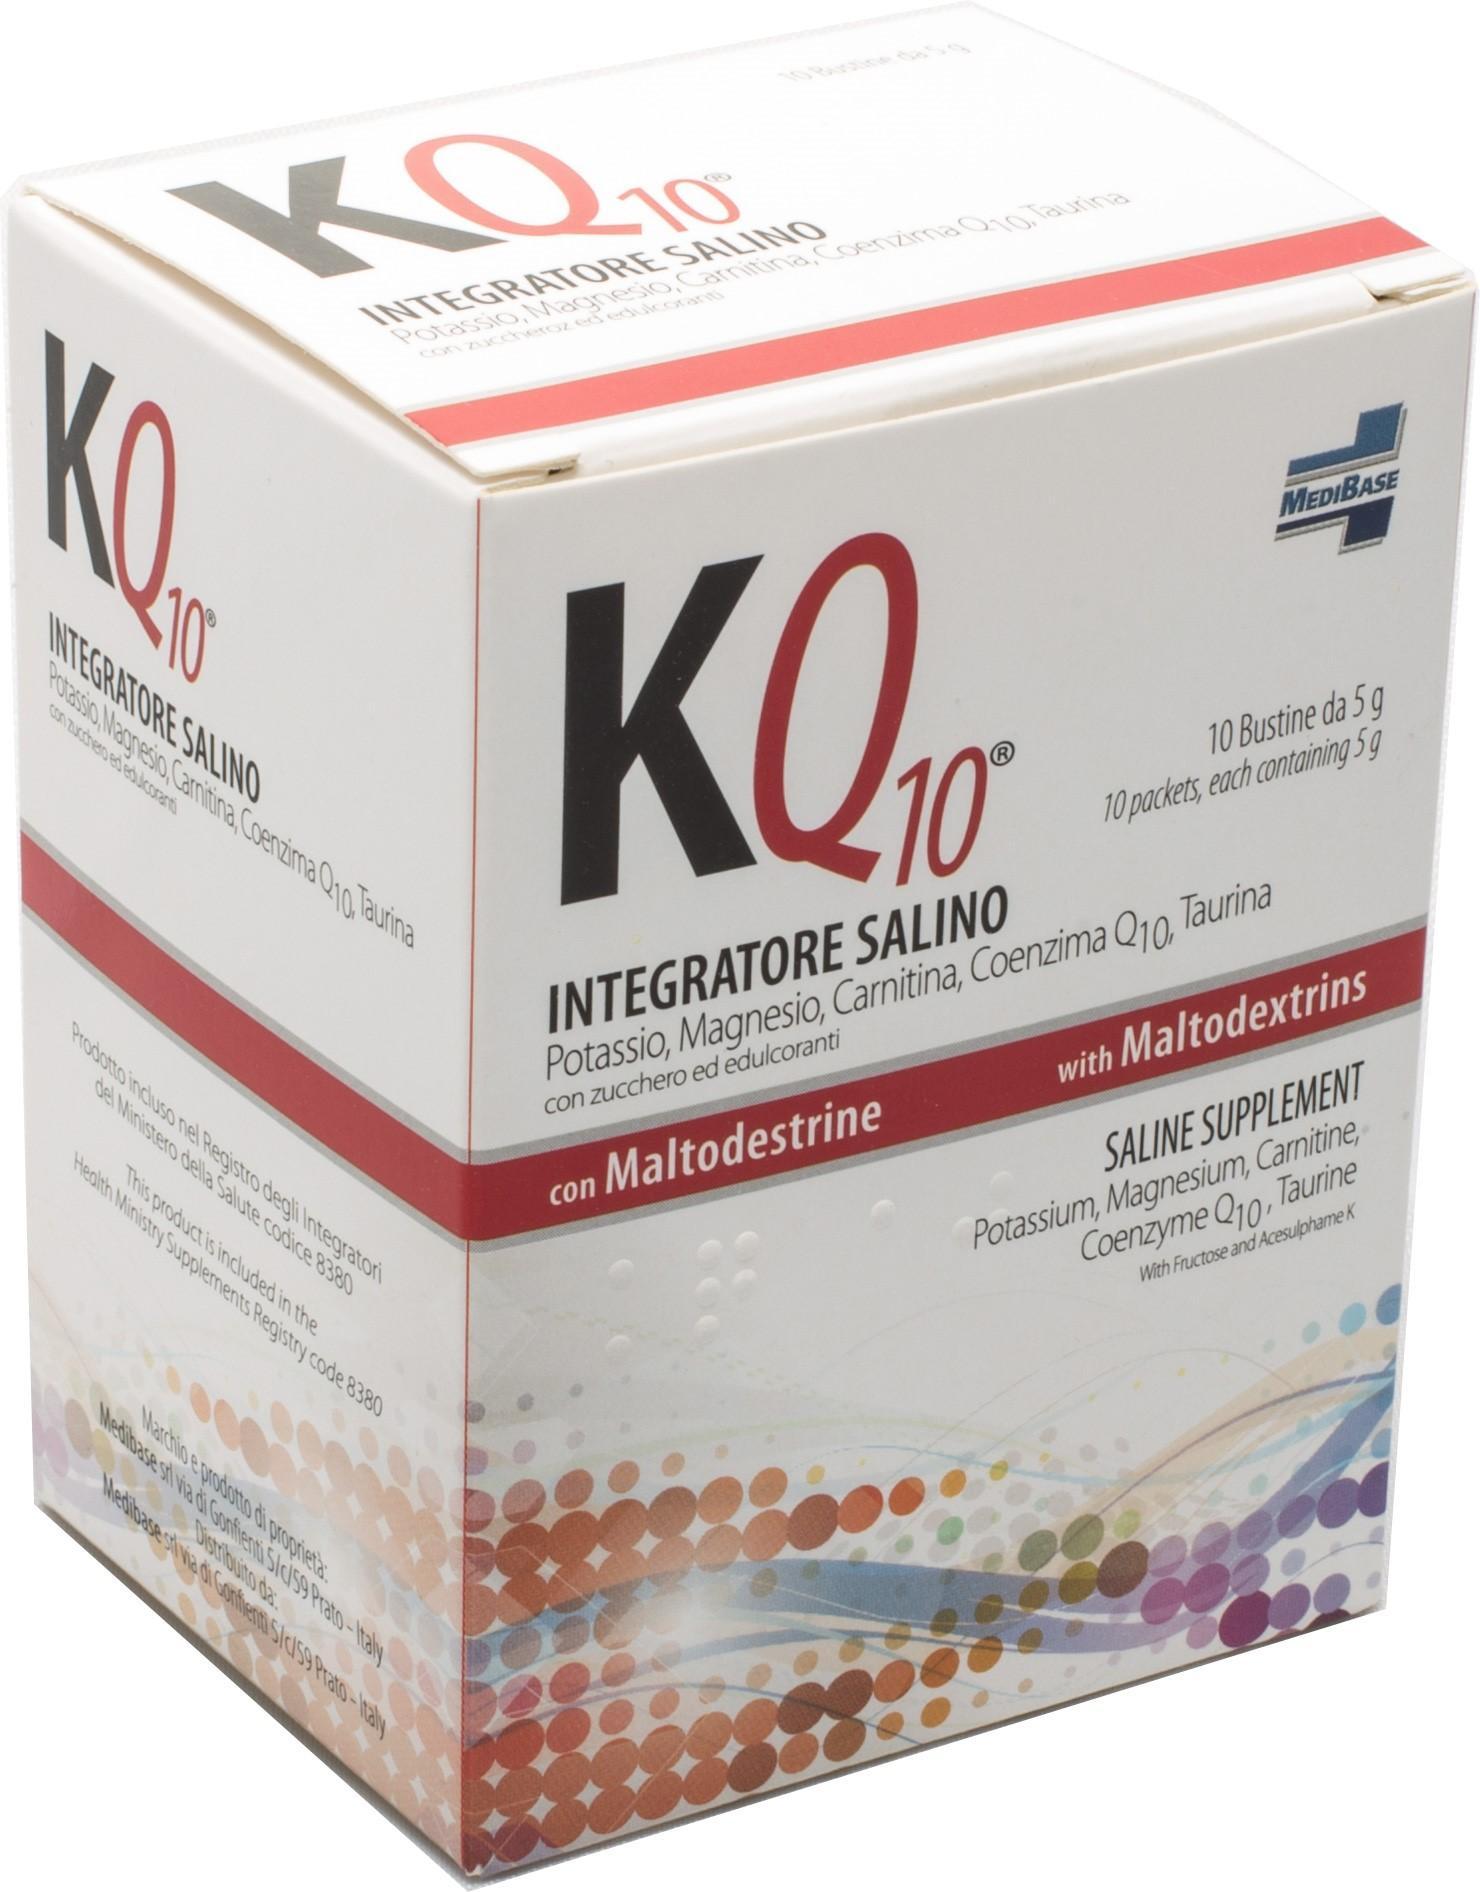 KQ10® BUSTE 10 5G